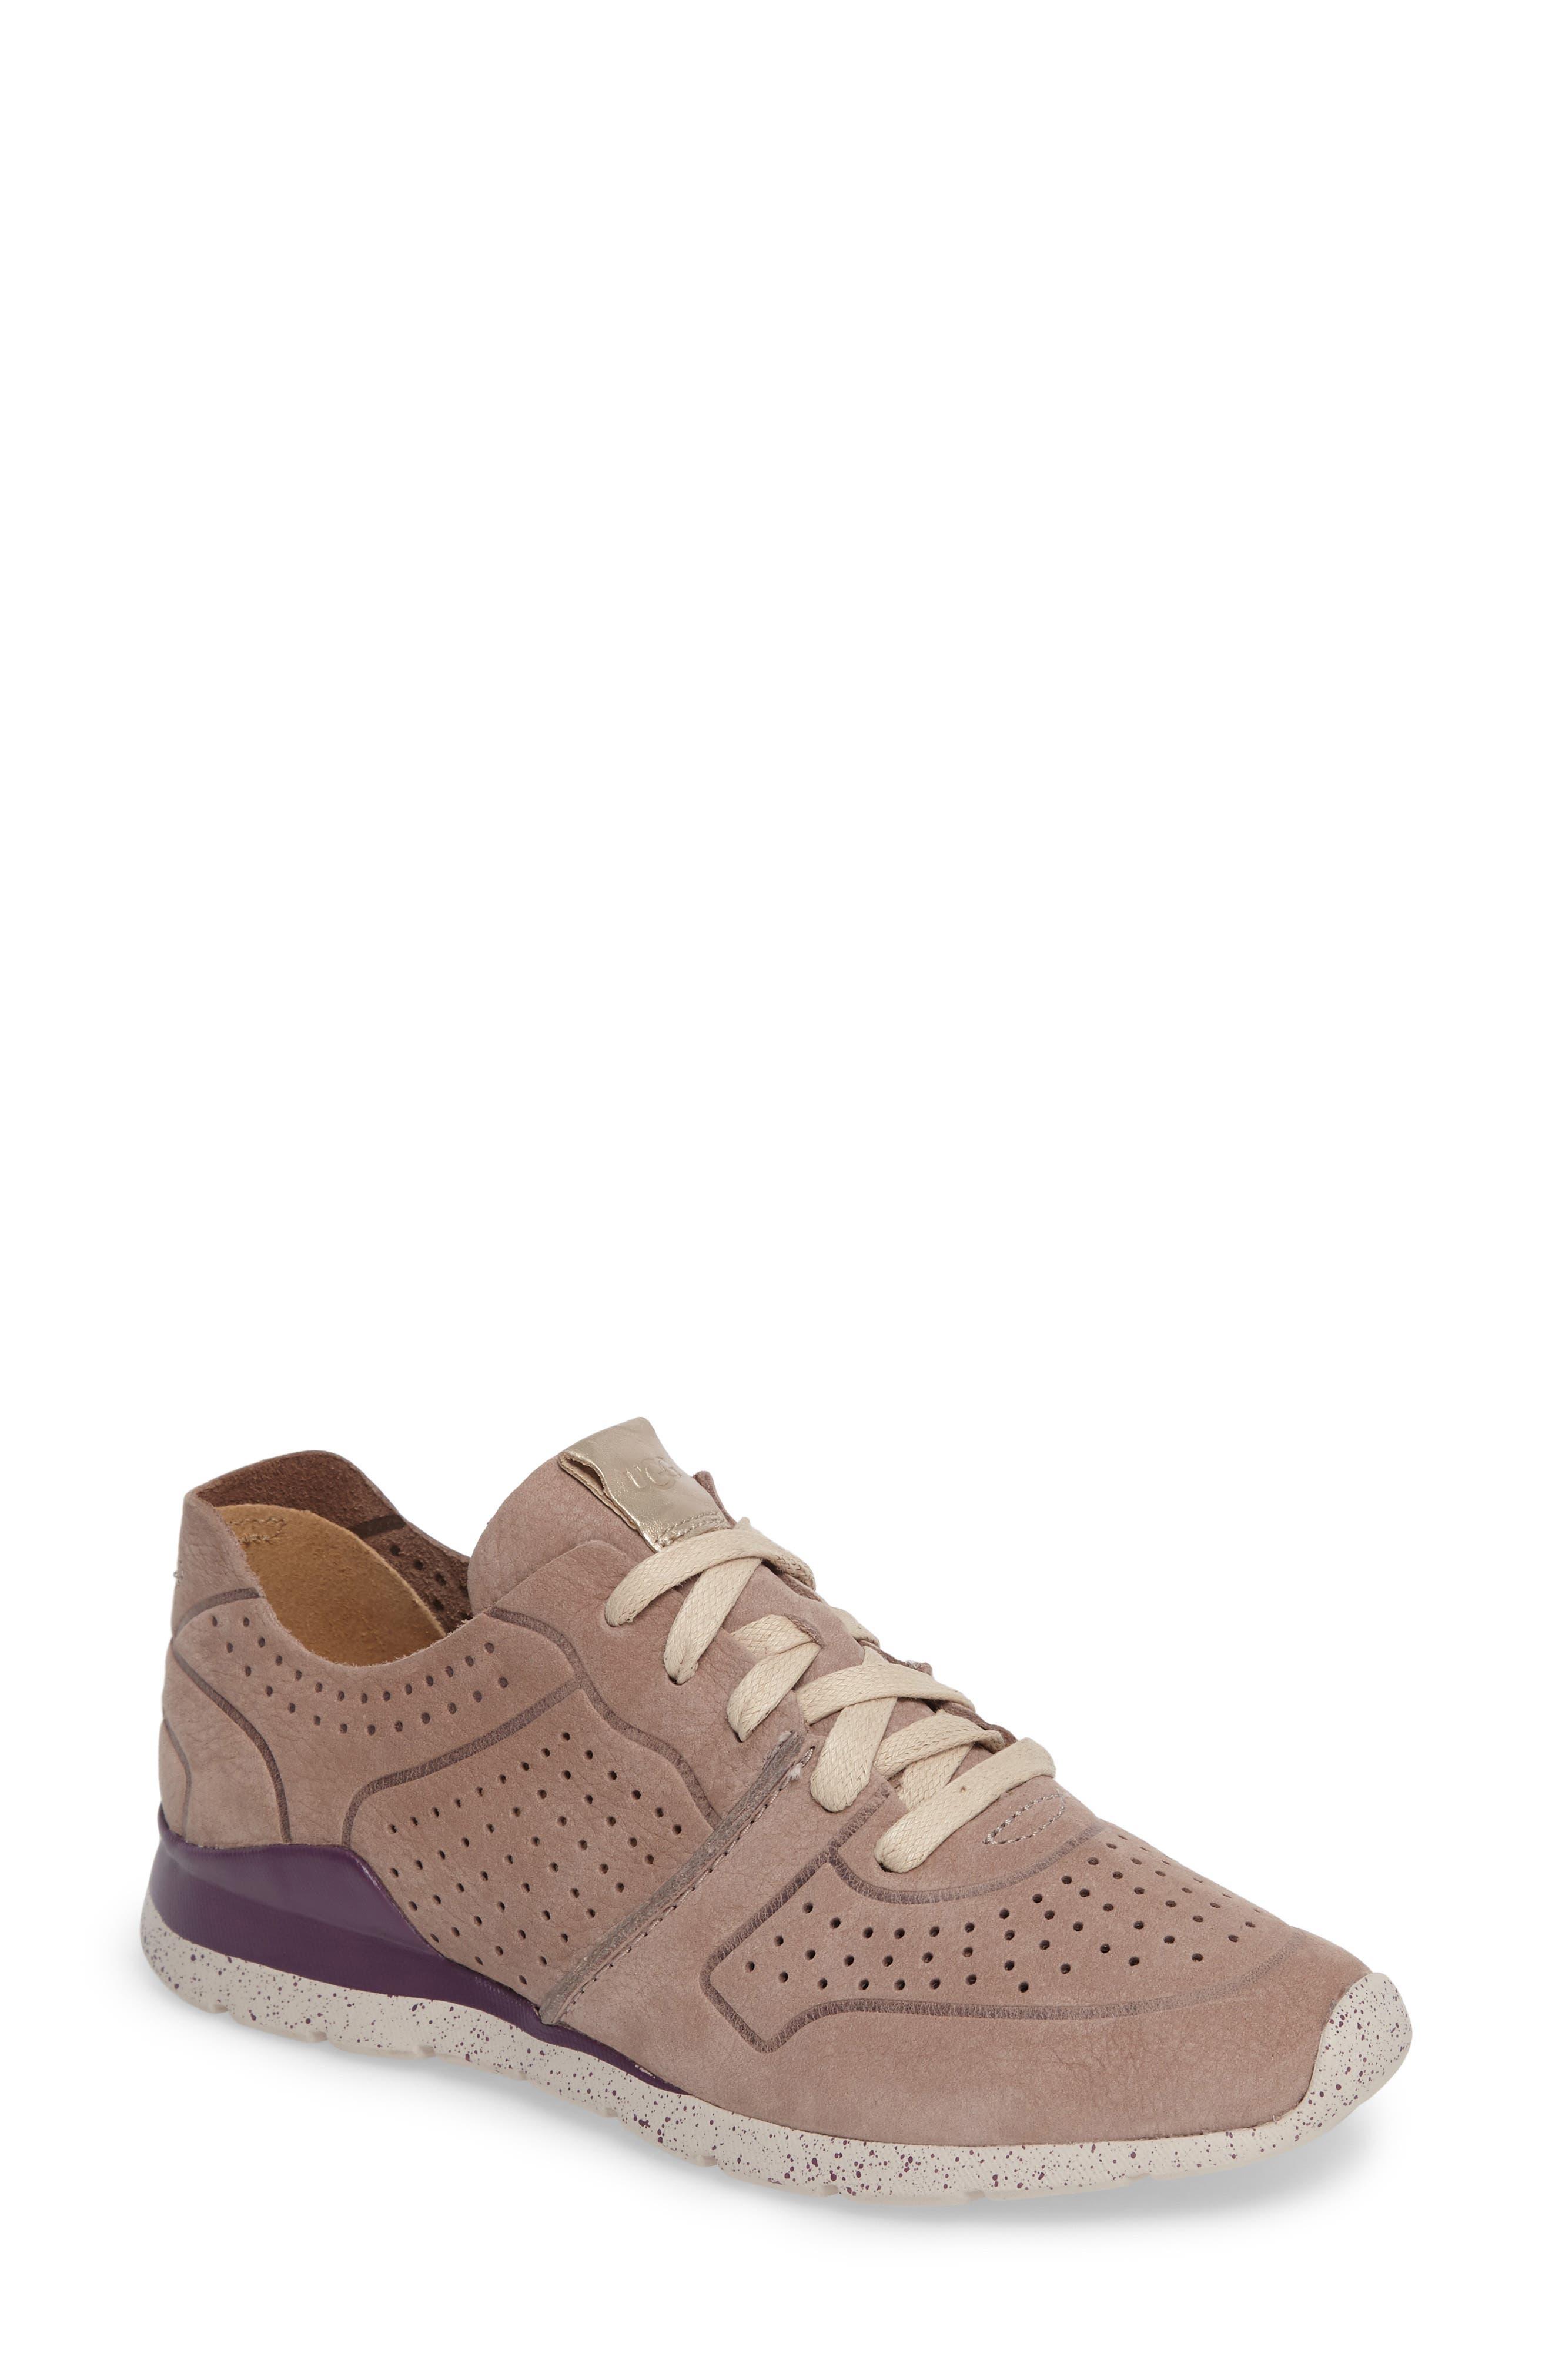 Alternate Image 1 Selected - UGG® Tye Sneaker (Women)